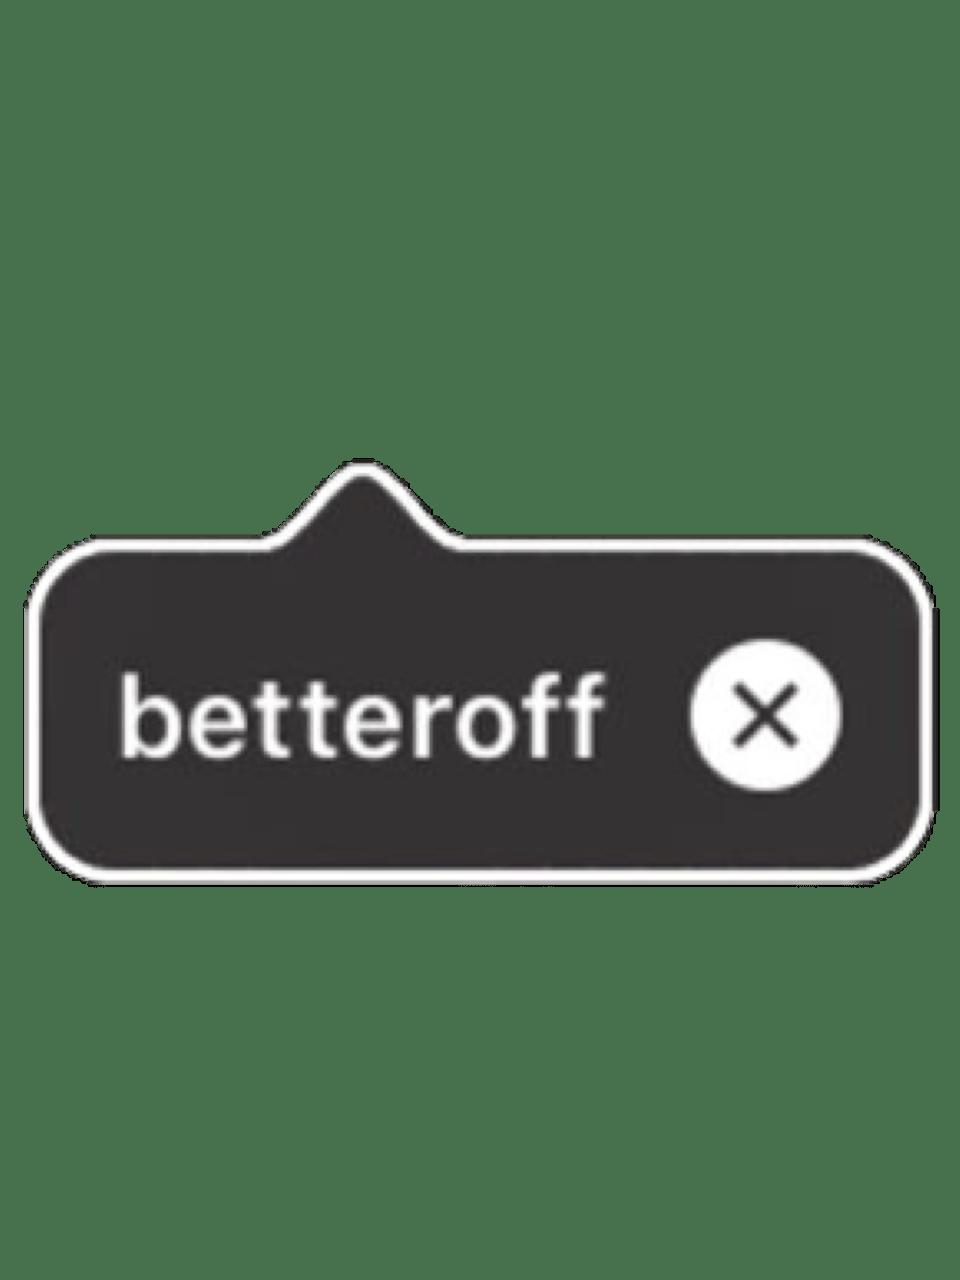 Edit Overlay Aesthetic Random Sticker Lcvingchi - Year of